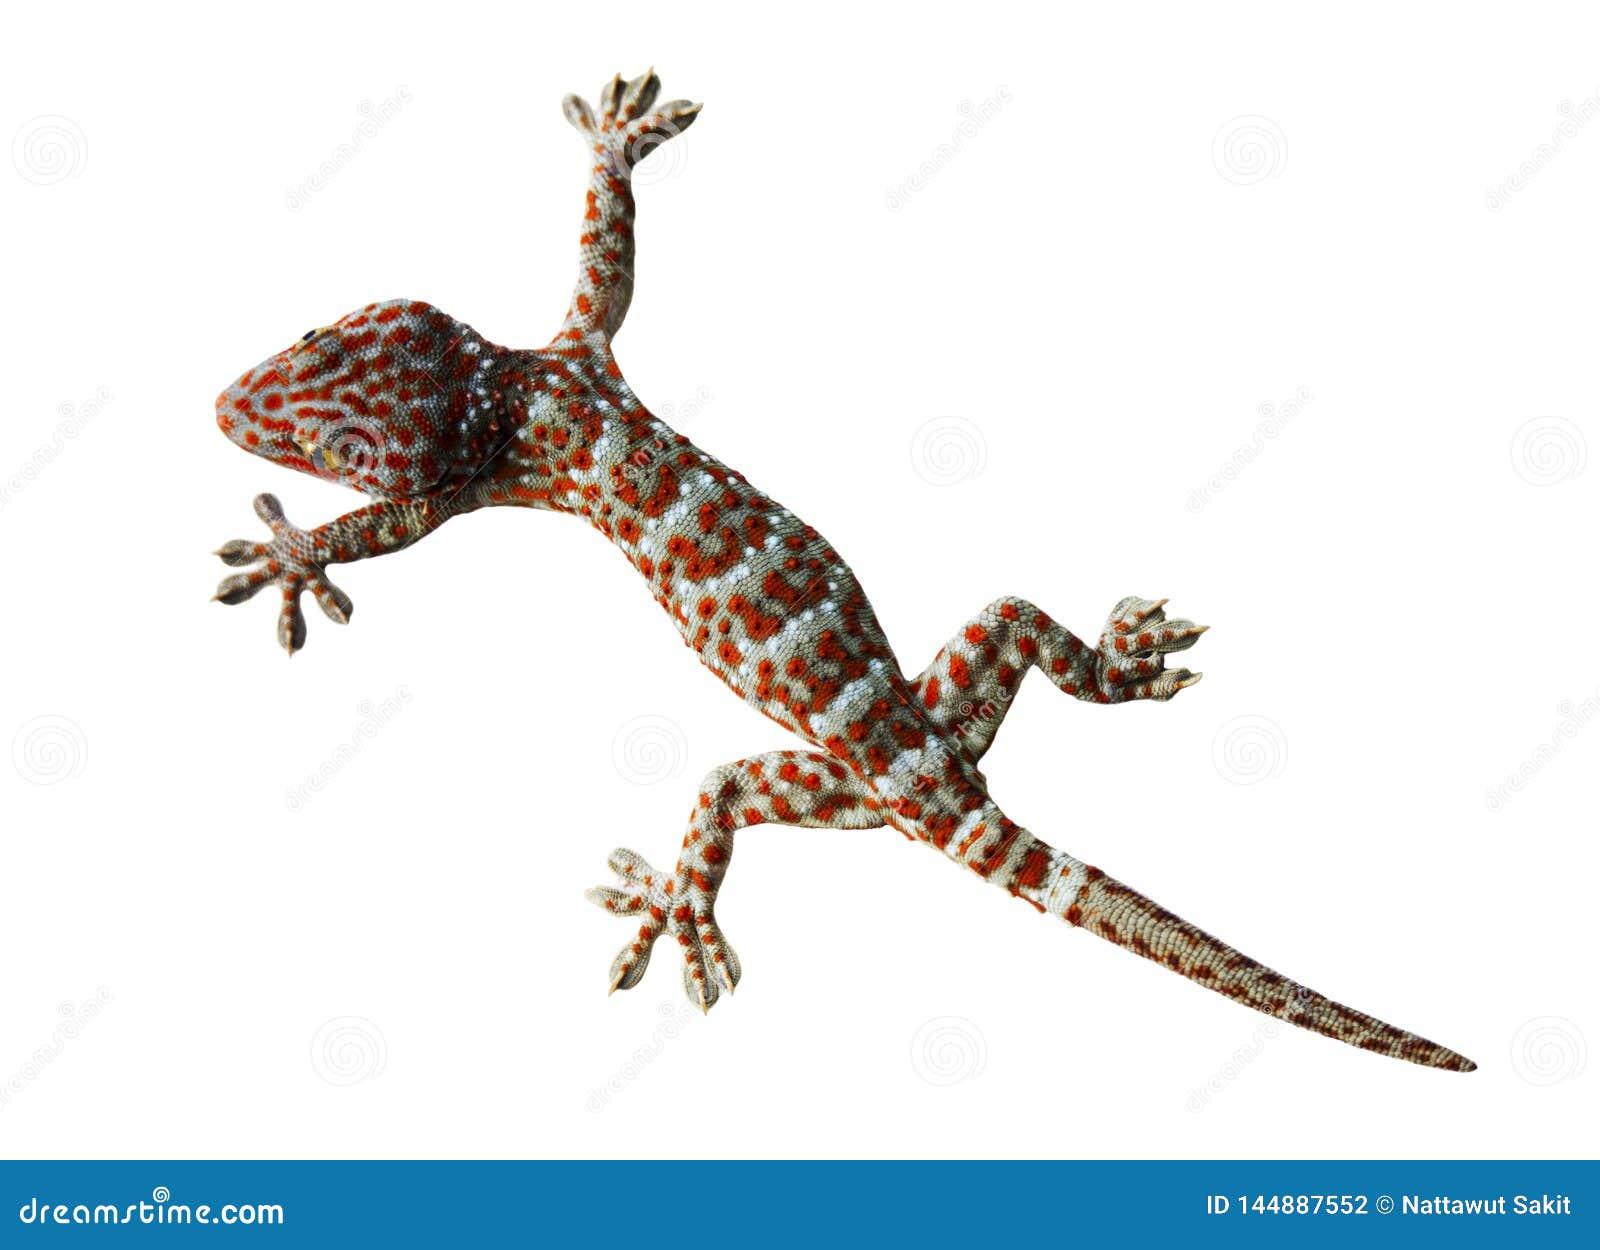 Gecko που απομονώνεται σε ένα άσπρο υπόβαθρο